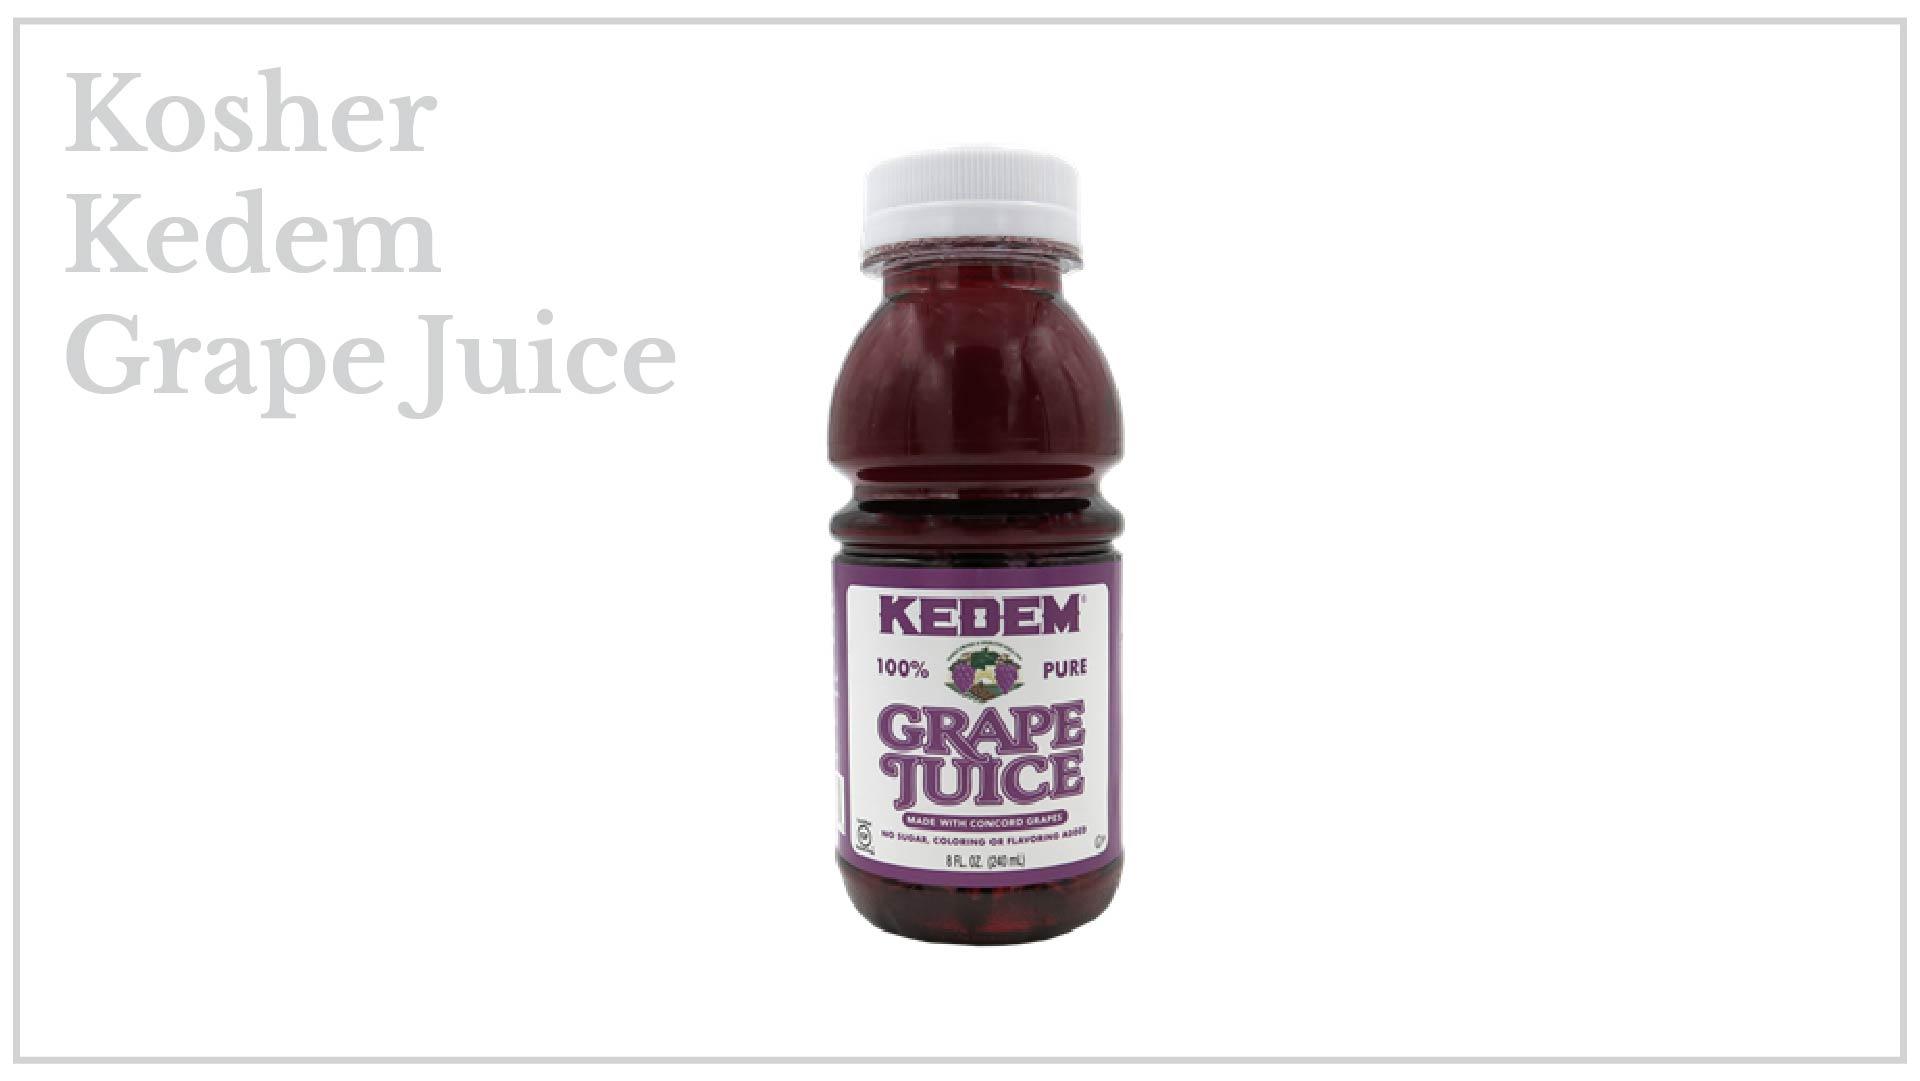 Kosher Kedem Grape Juice